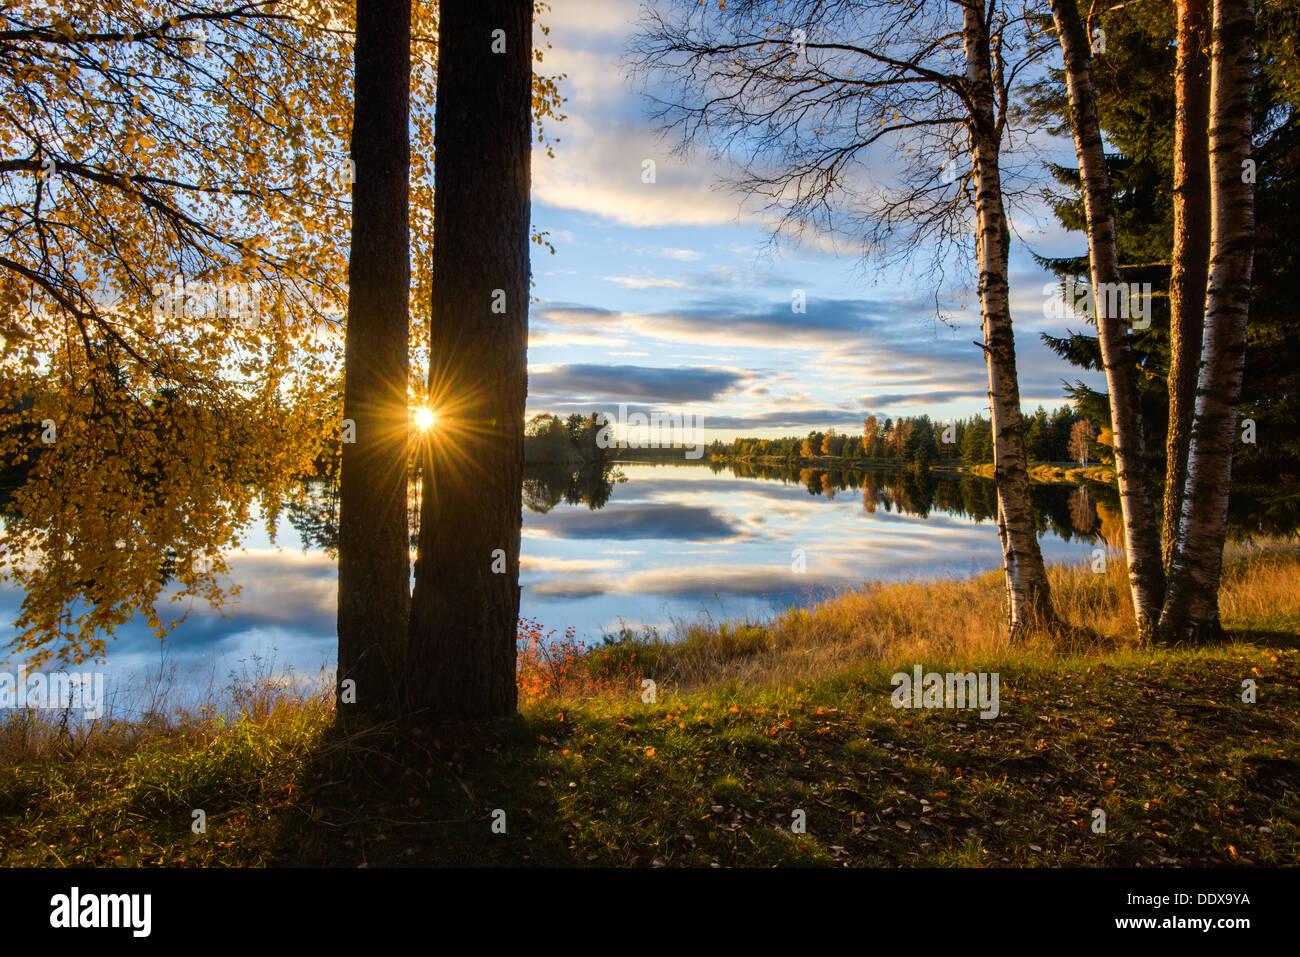 Rural scene at sunset, Fänforsen, Dalarna, Sweden - Stock Image